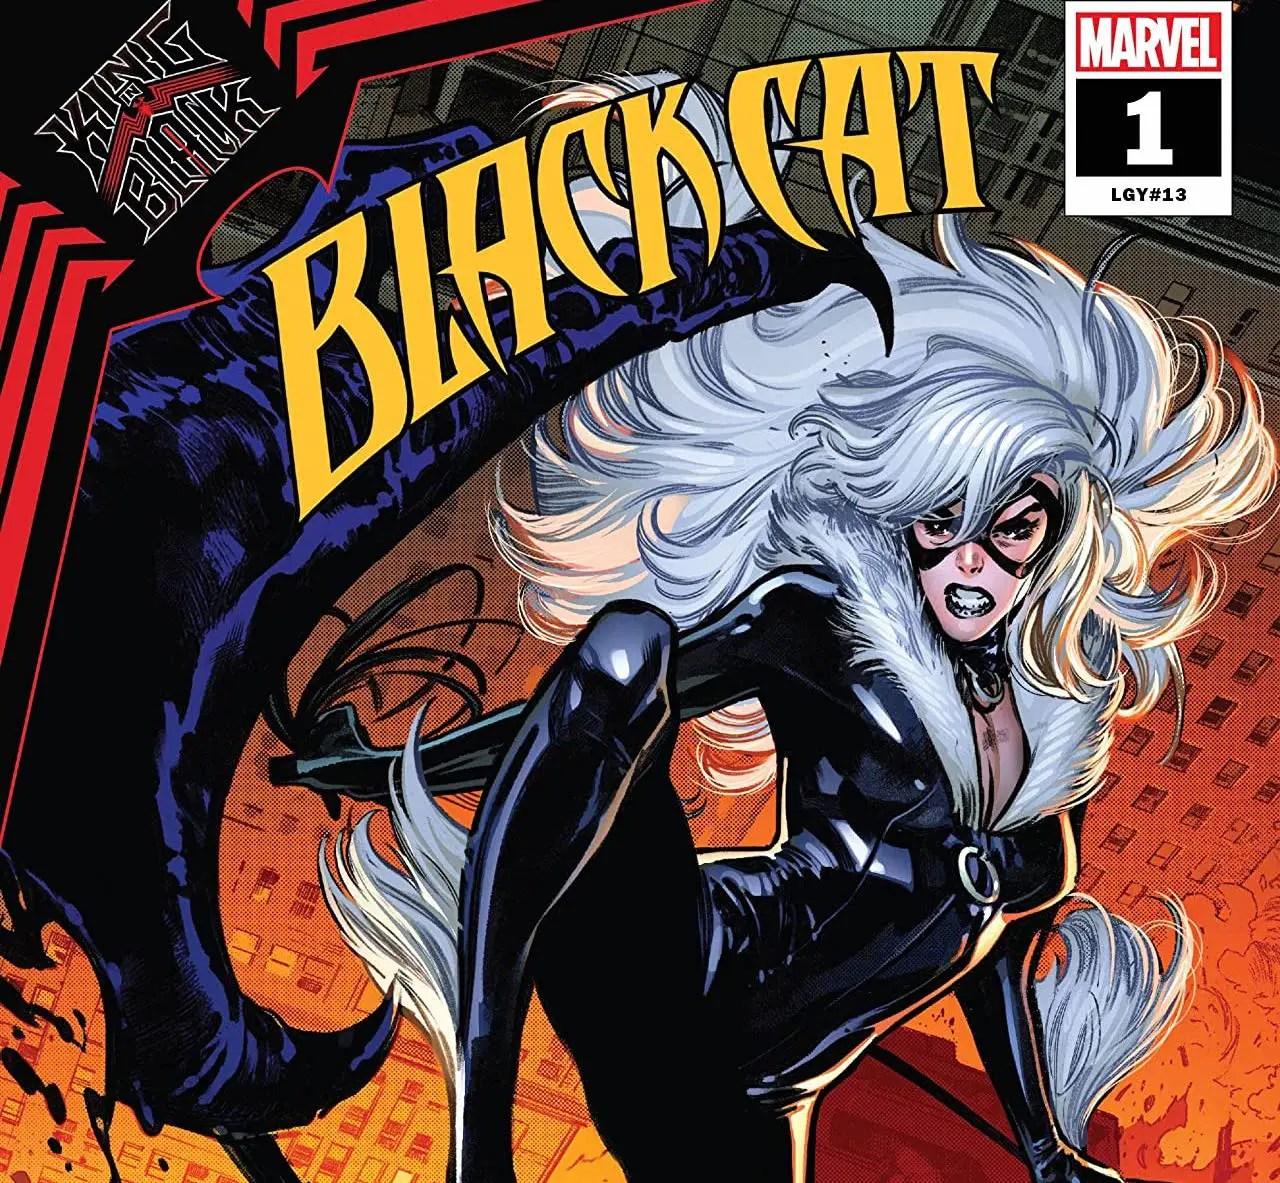 'Black Cat' #1 review